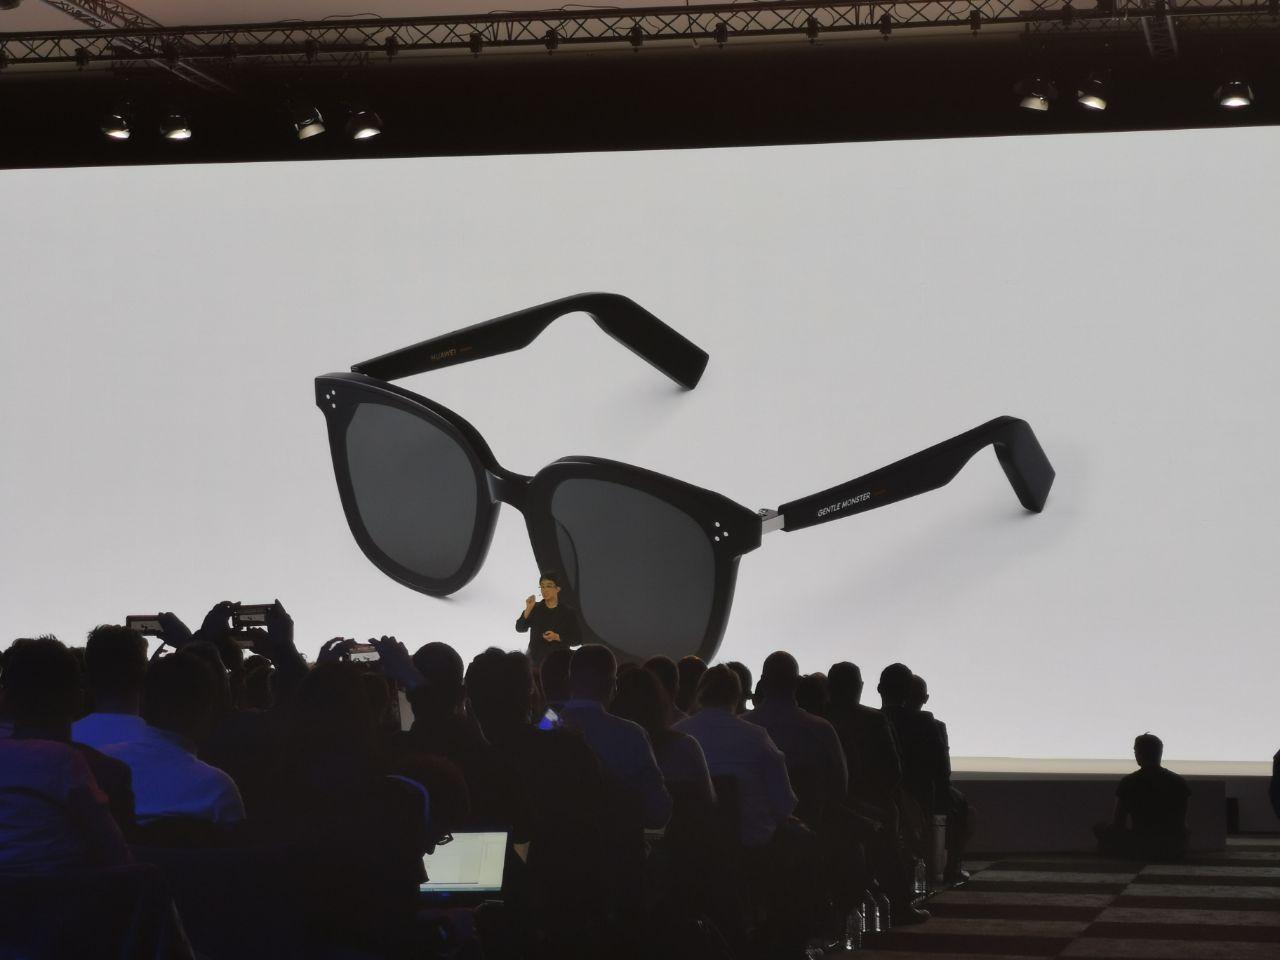 Así son las gafas inteligentes de Huawei X GENTLEMONSTER EYEWEAR